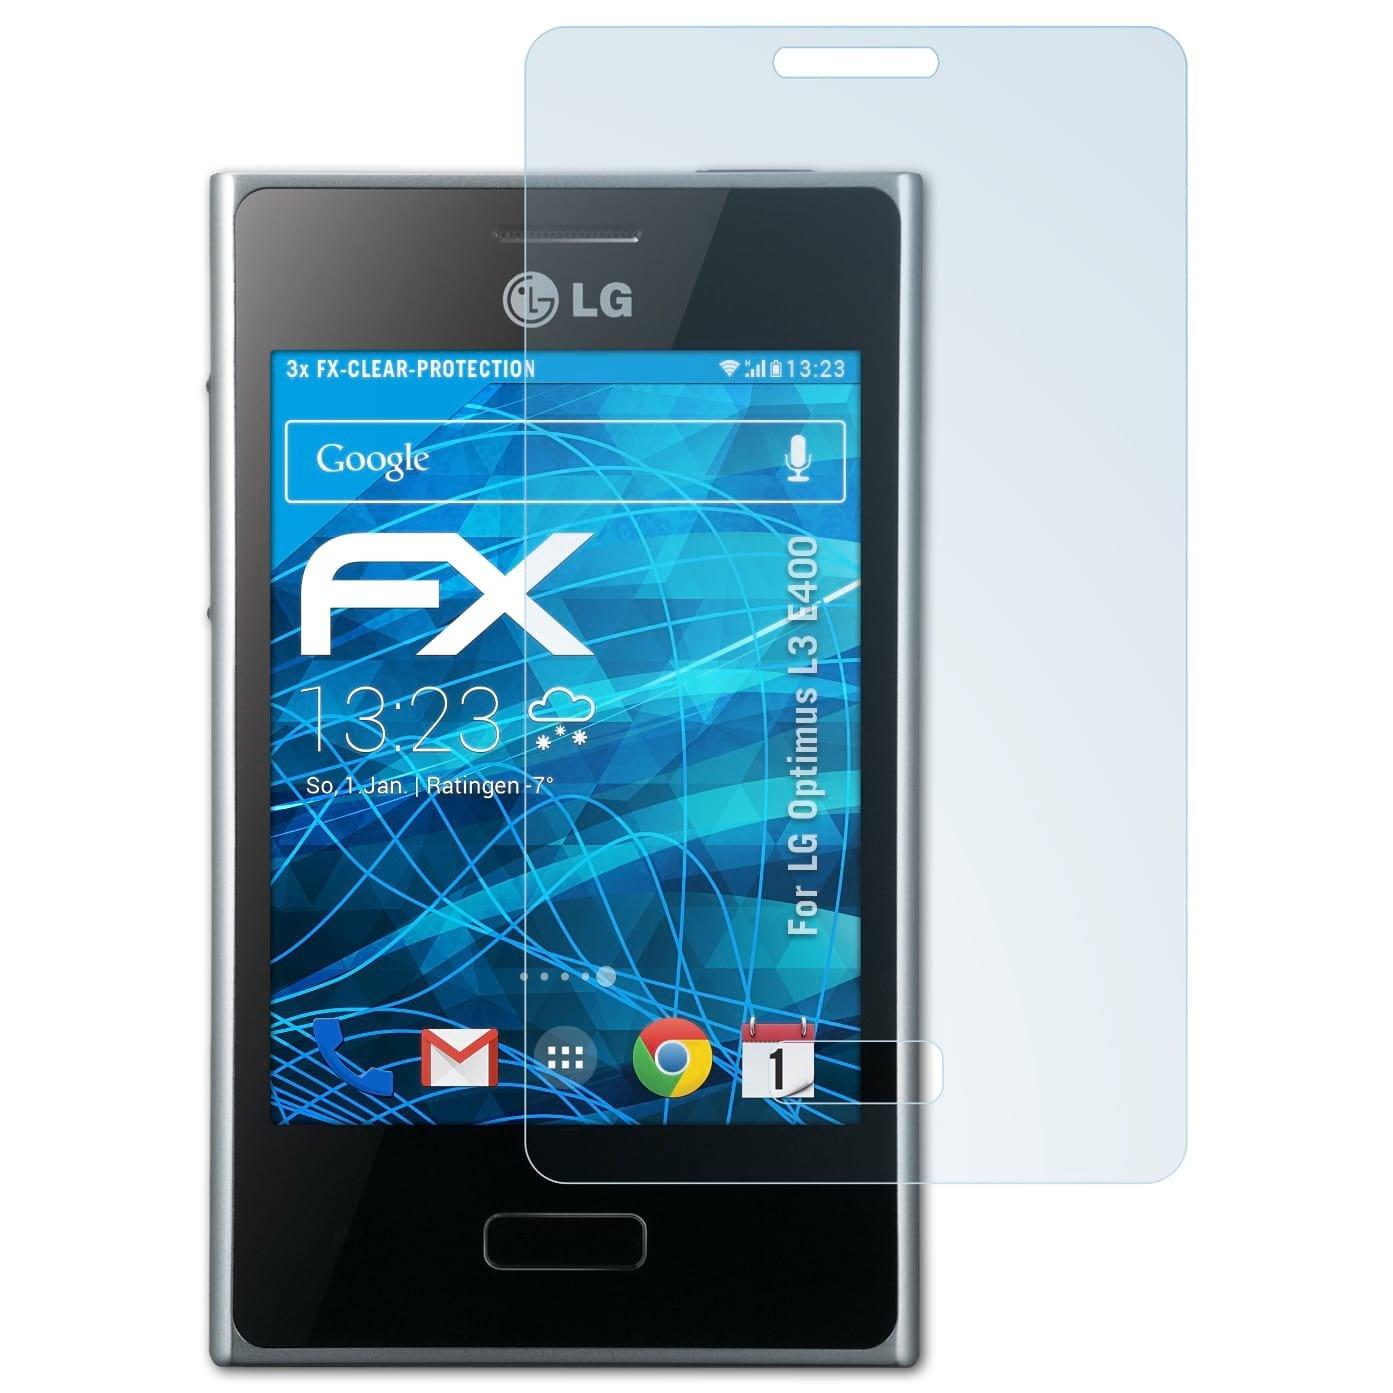 atFoliX Lámina Protectora de Pantalla para LG Optimus L3 (E400) Película  Protectora: Amazon.es: Electrónica